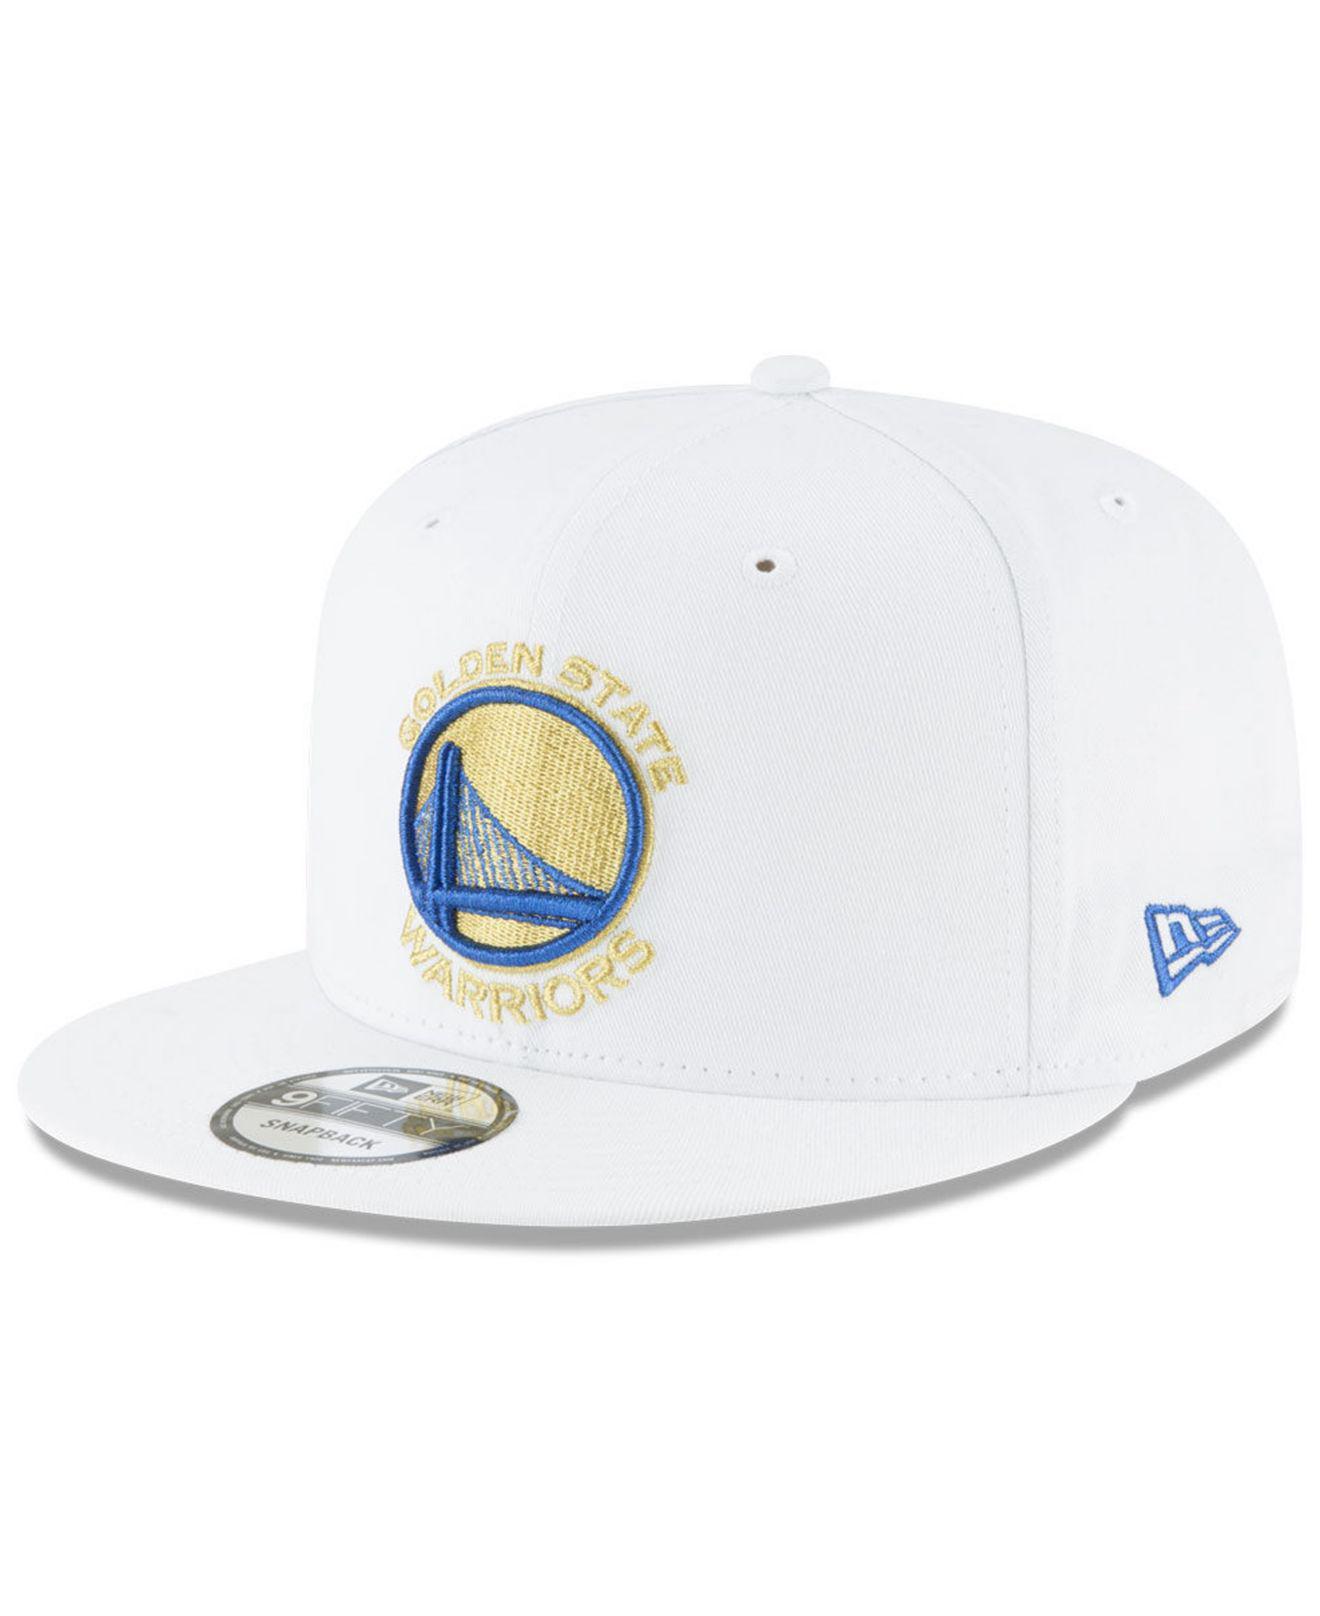 Lyst - Ktz Golden State Warriors Team Metallic 9fifty Snapback Cap ... 693dc3c19